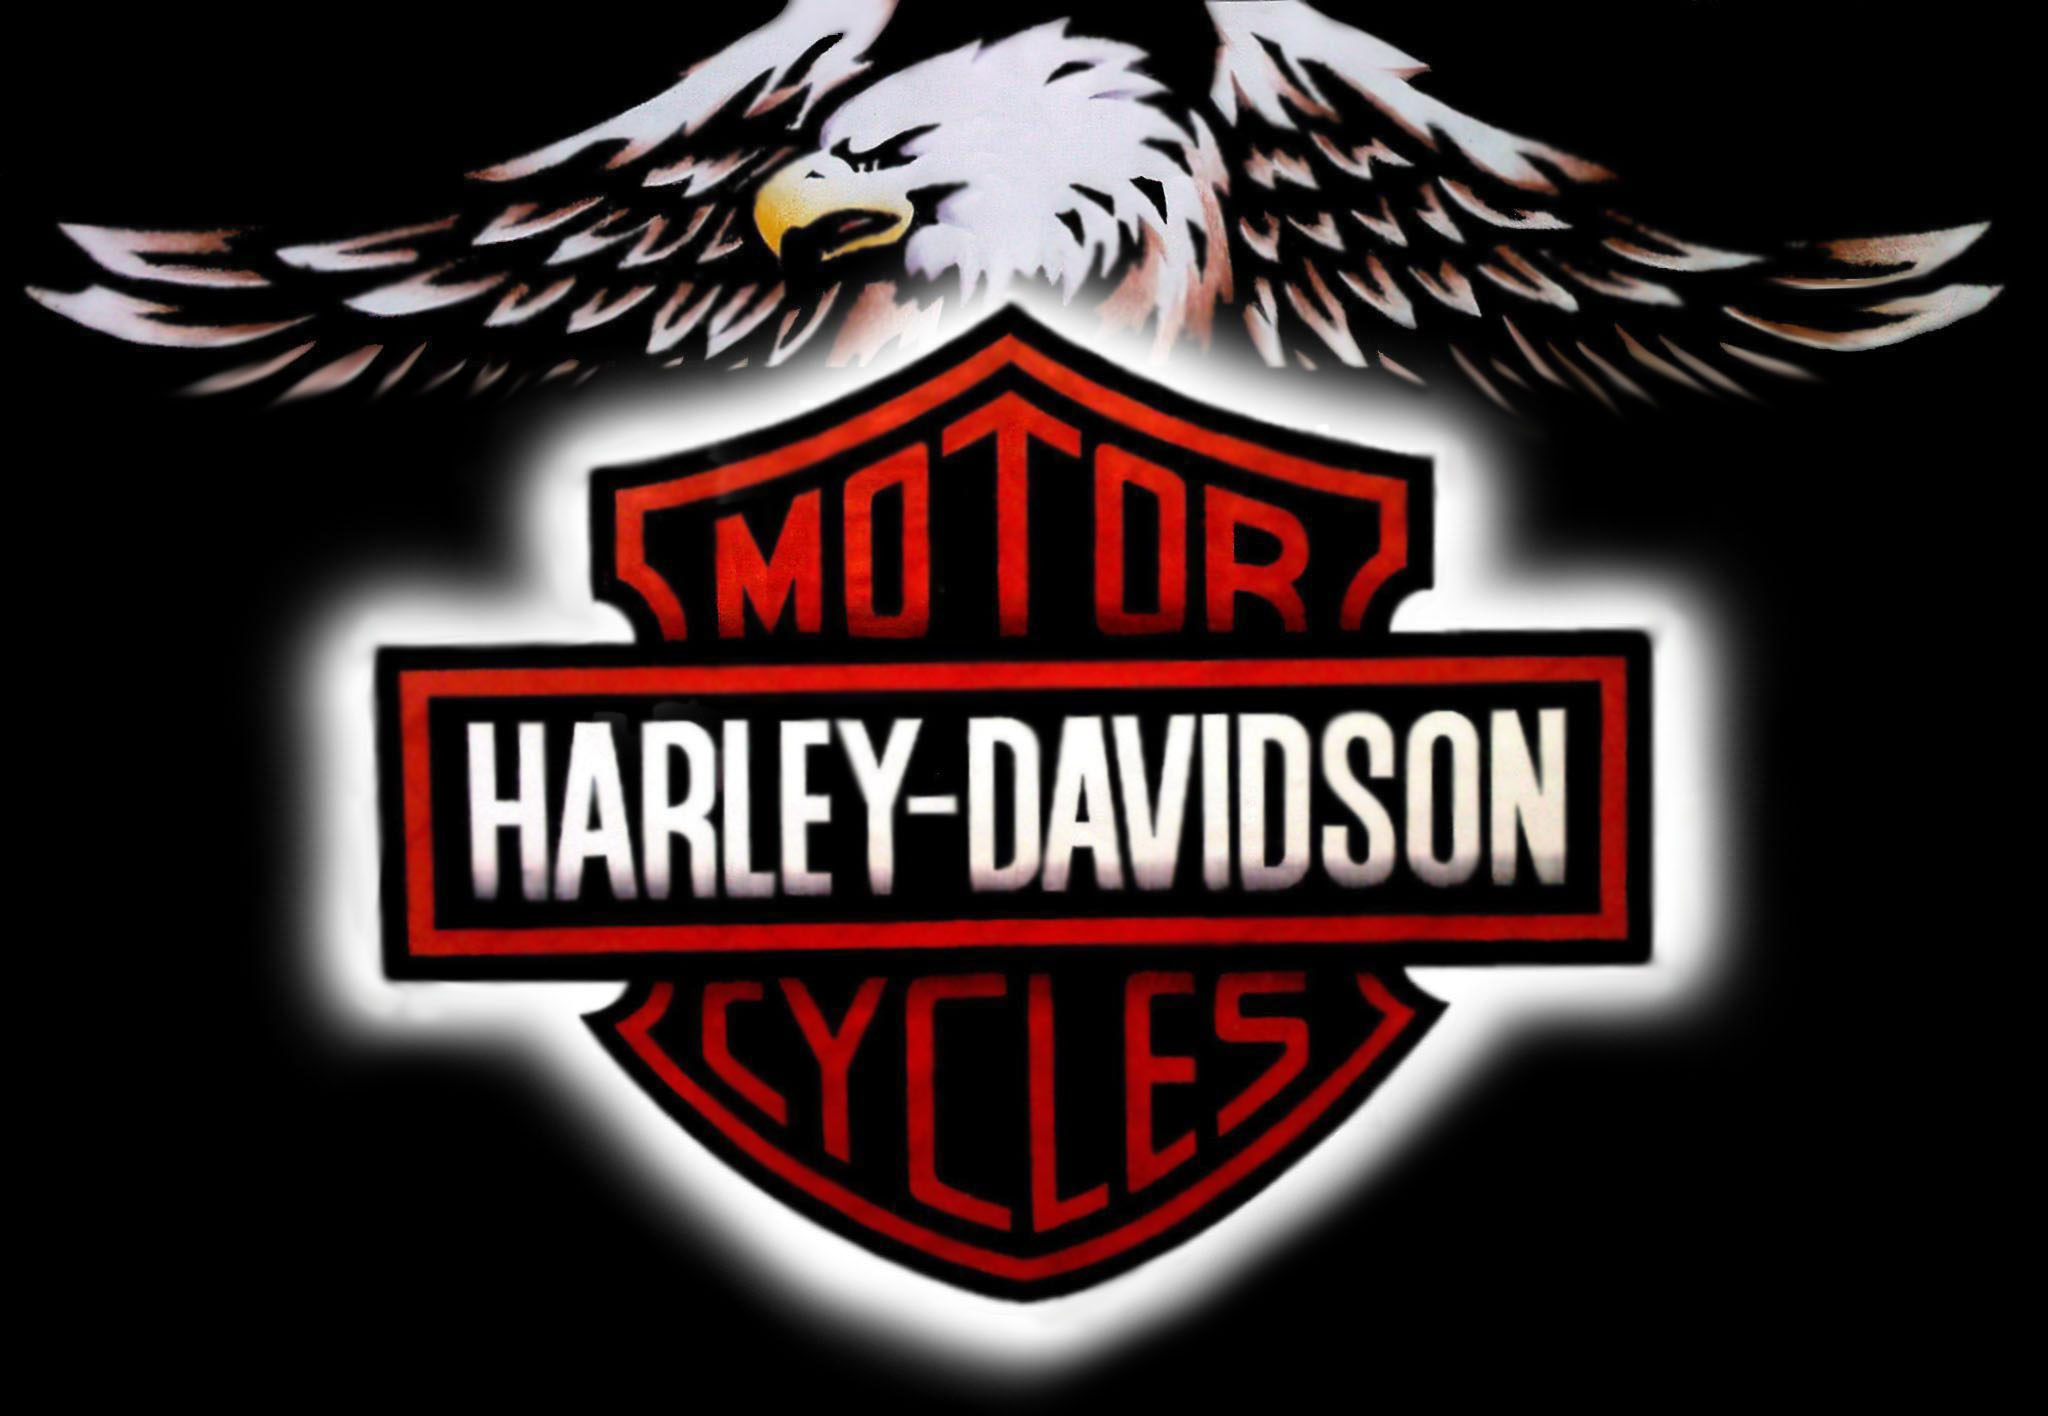 Harley Davidson clipart eagle  davidson Collection davidson logo